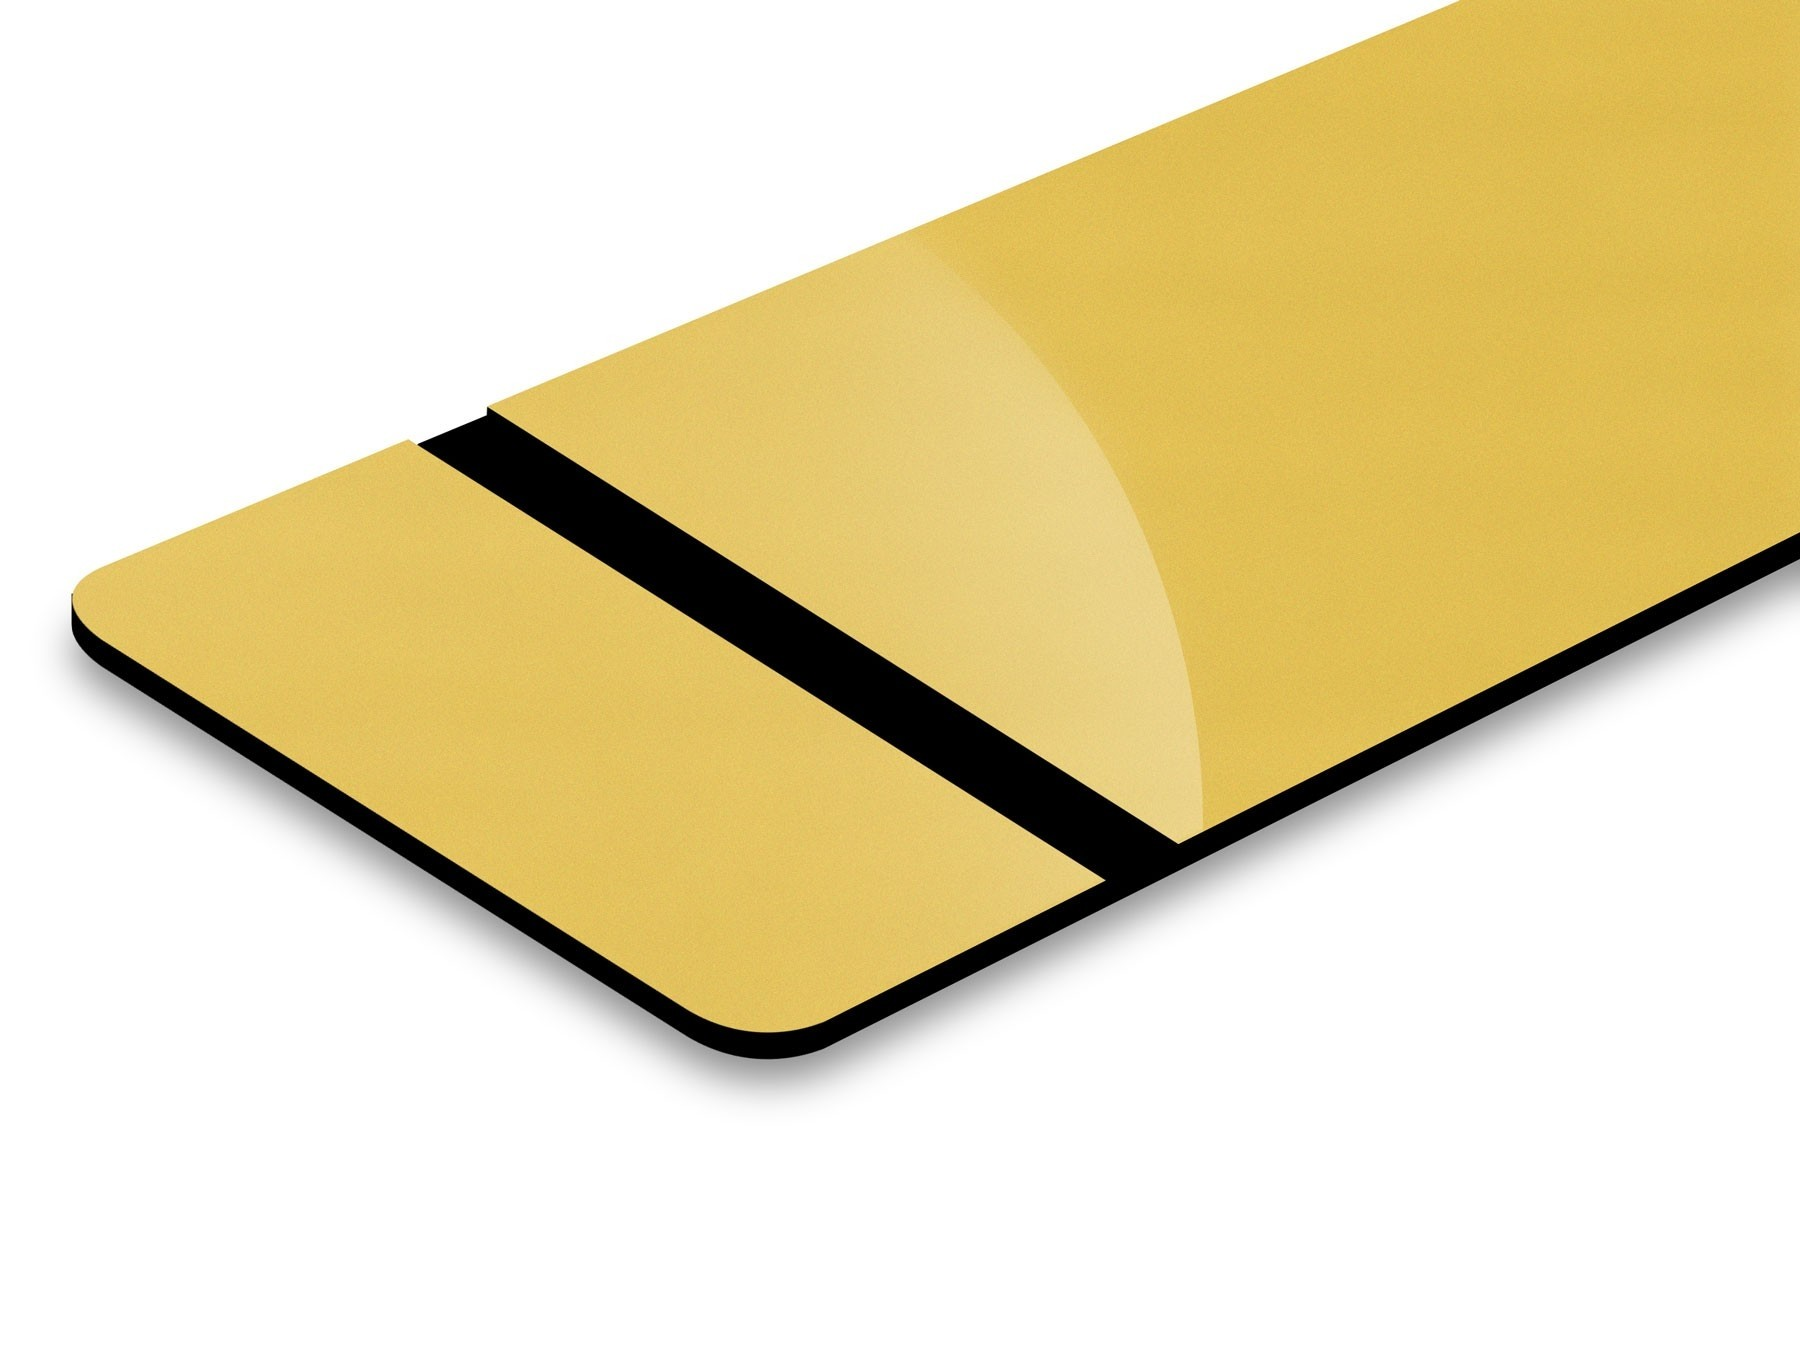 TroLase Thins, Trophy Gold/Black, 2ply, 0.5 mm